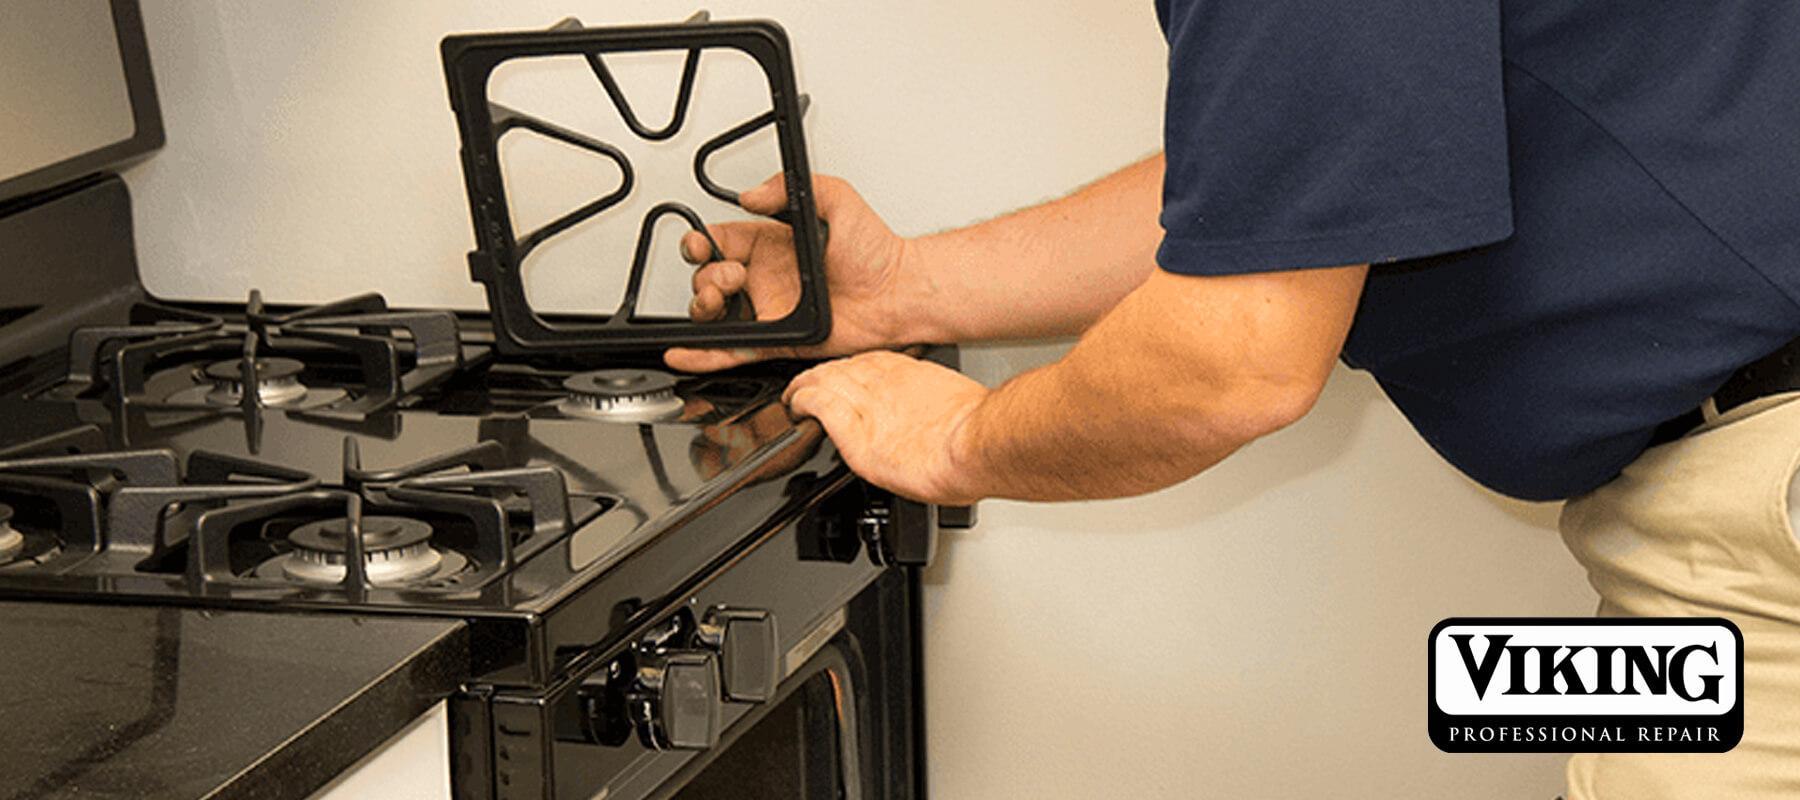 Viking Range Cleaning Service | Professional Viking Repair